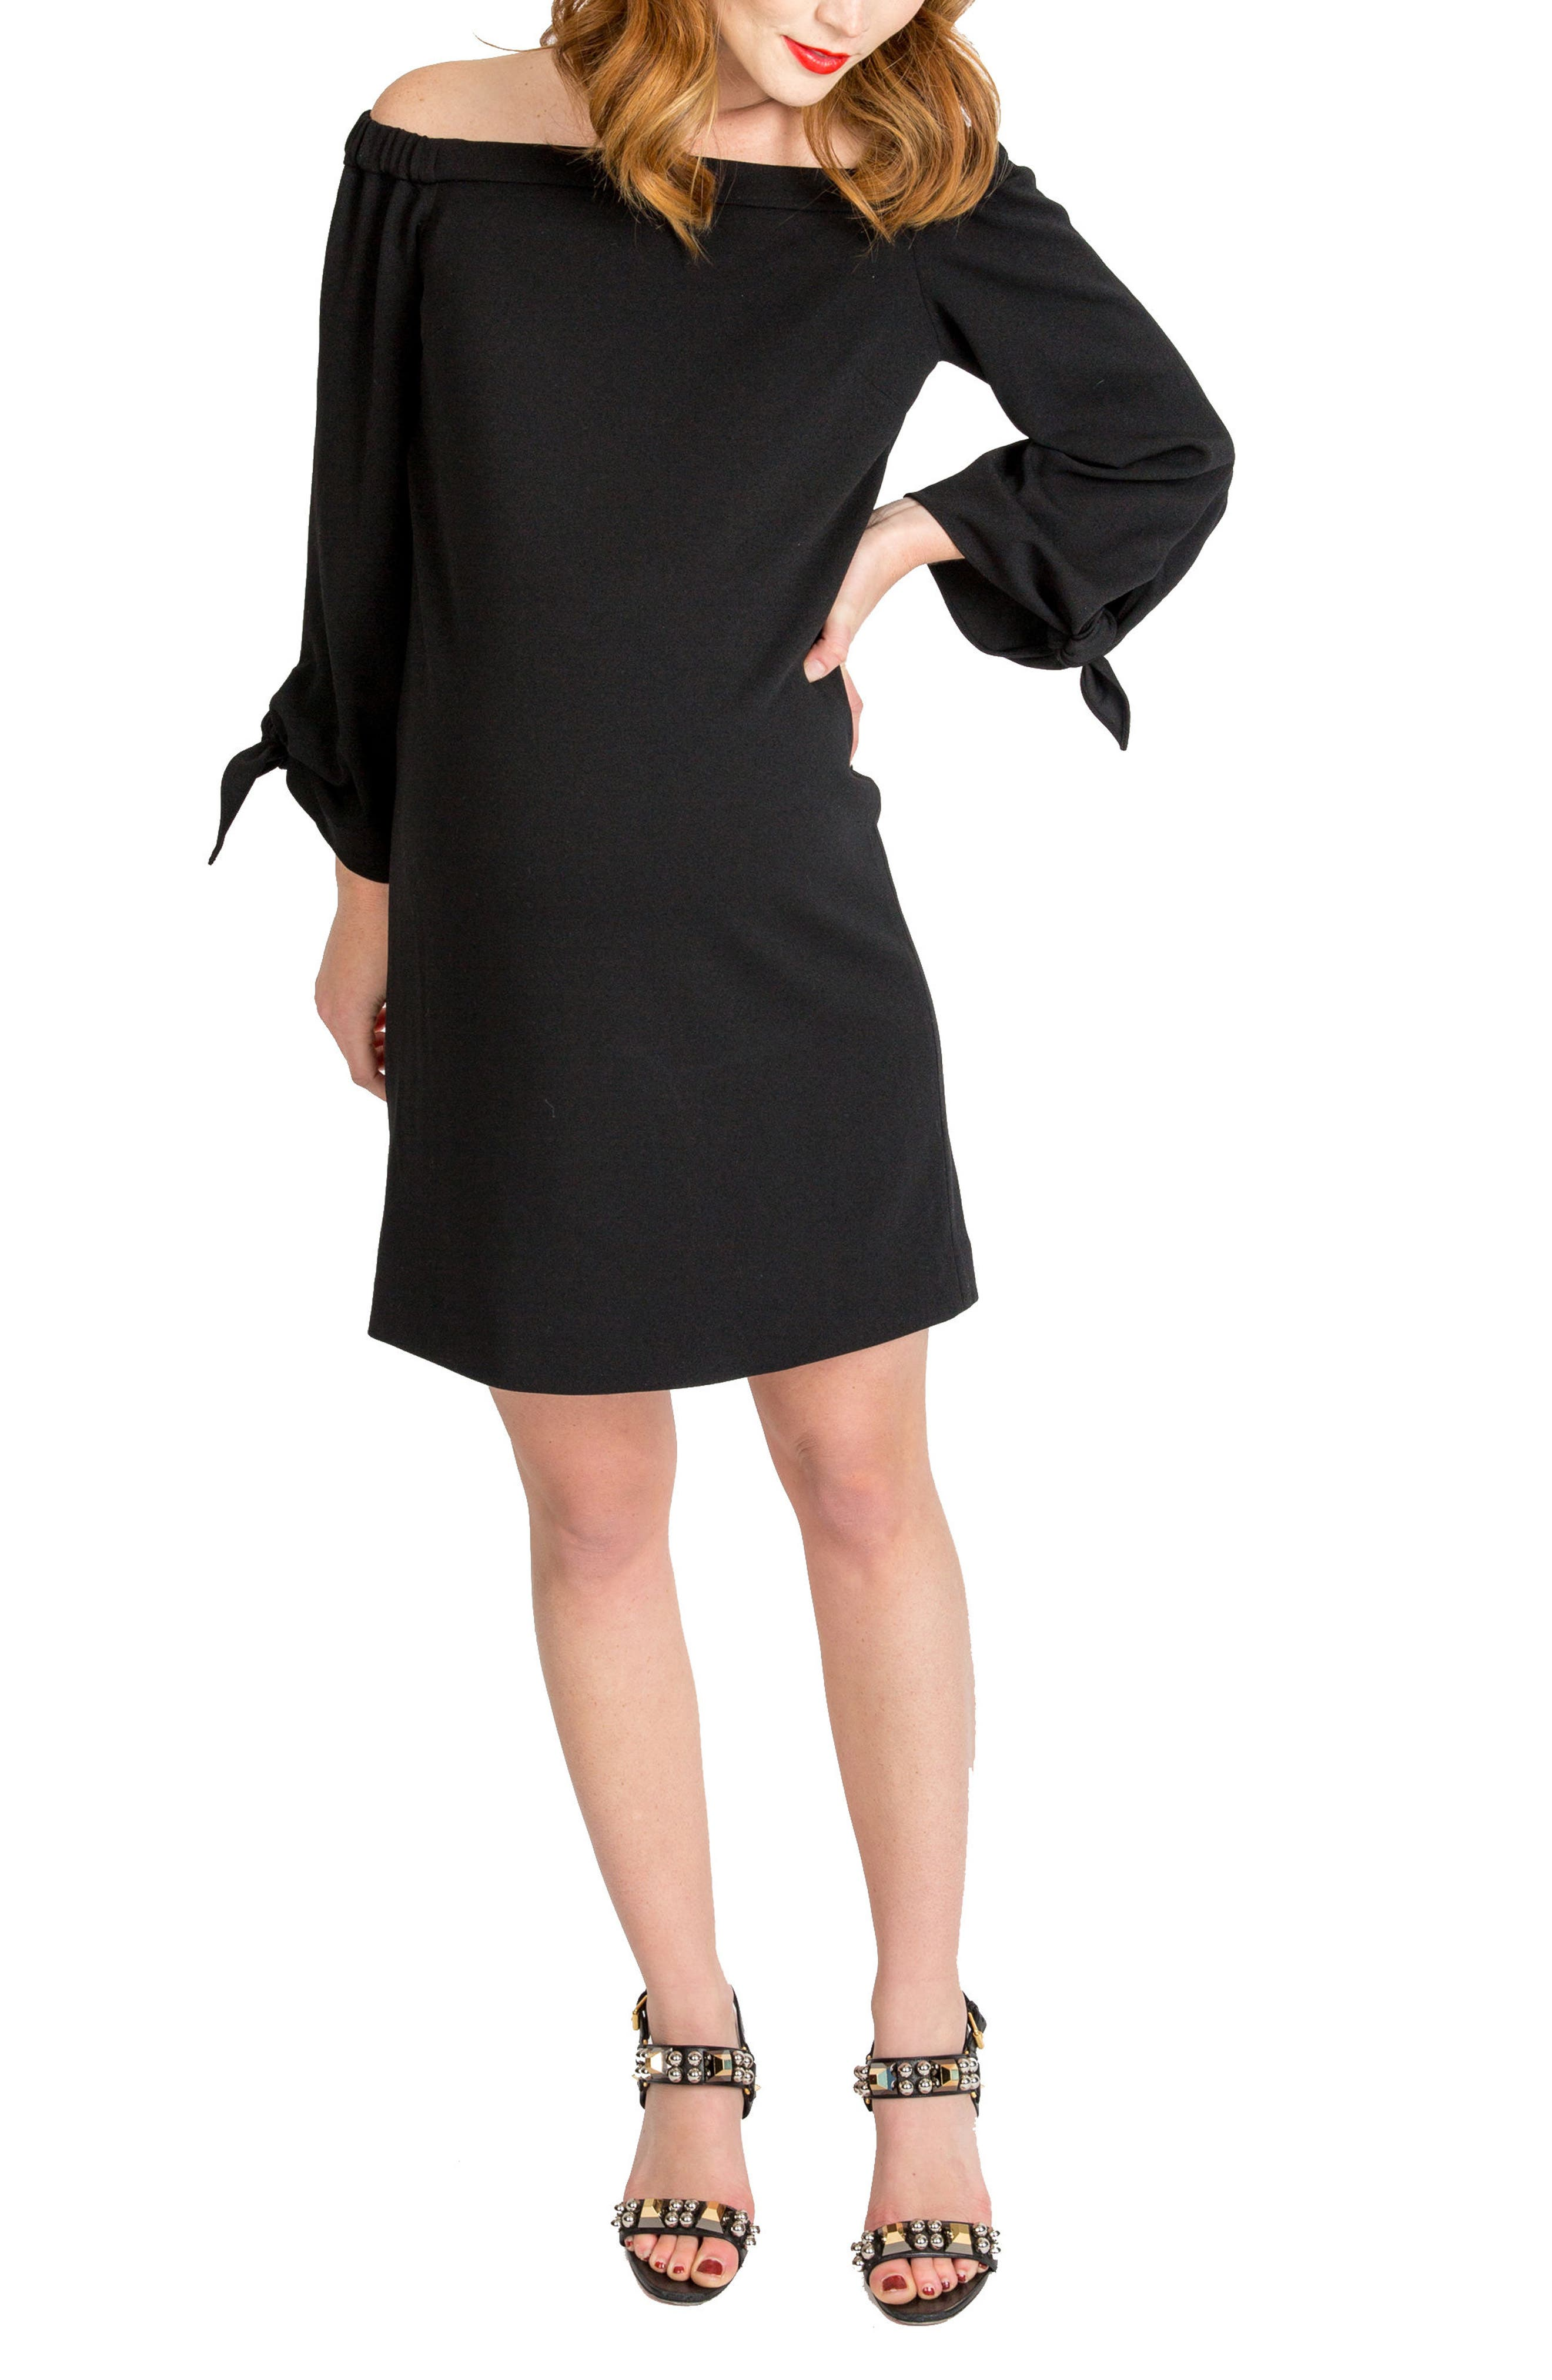 Nom Maternity Octavia Off The Shoulder Maternity Dress, Black